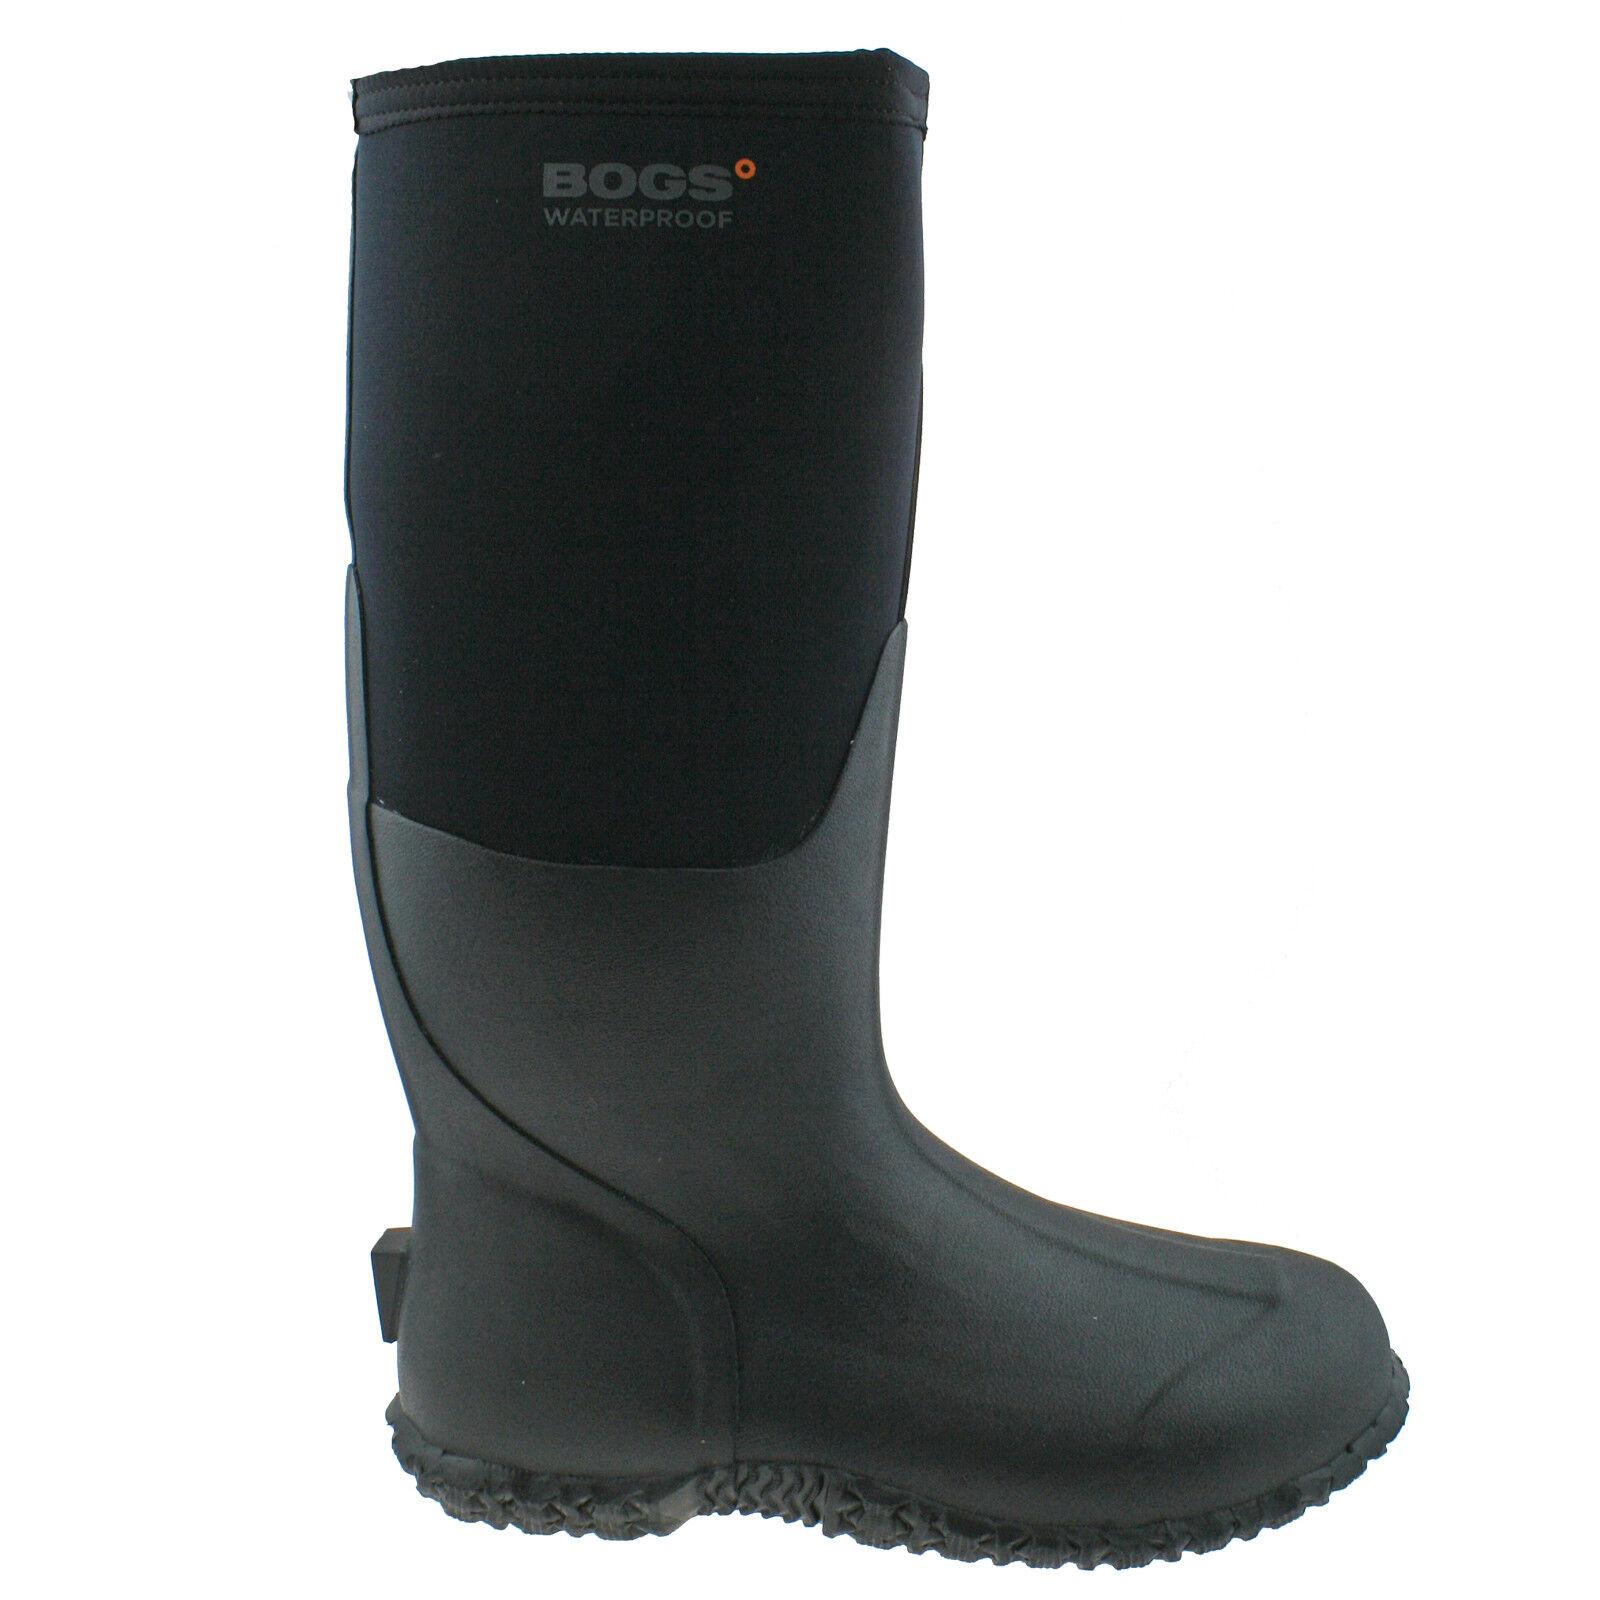 Femmes Bogs Carver Chaud Tall noir isolé Chaud Carver Imperméable Bottes Boot 78449 447bb8